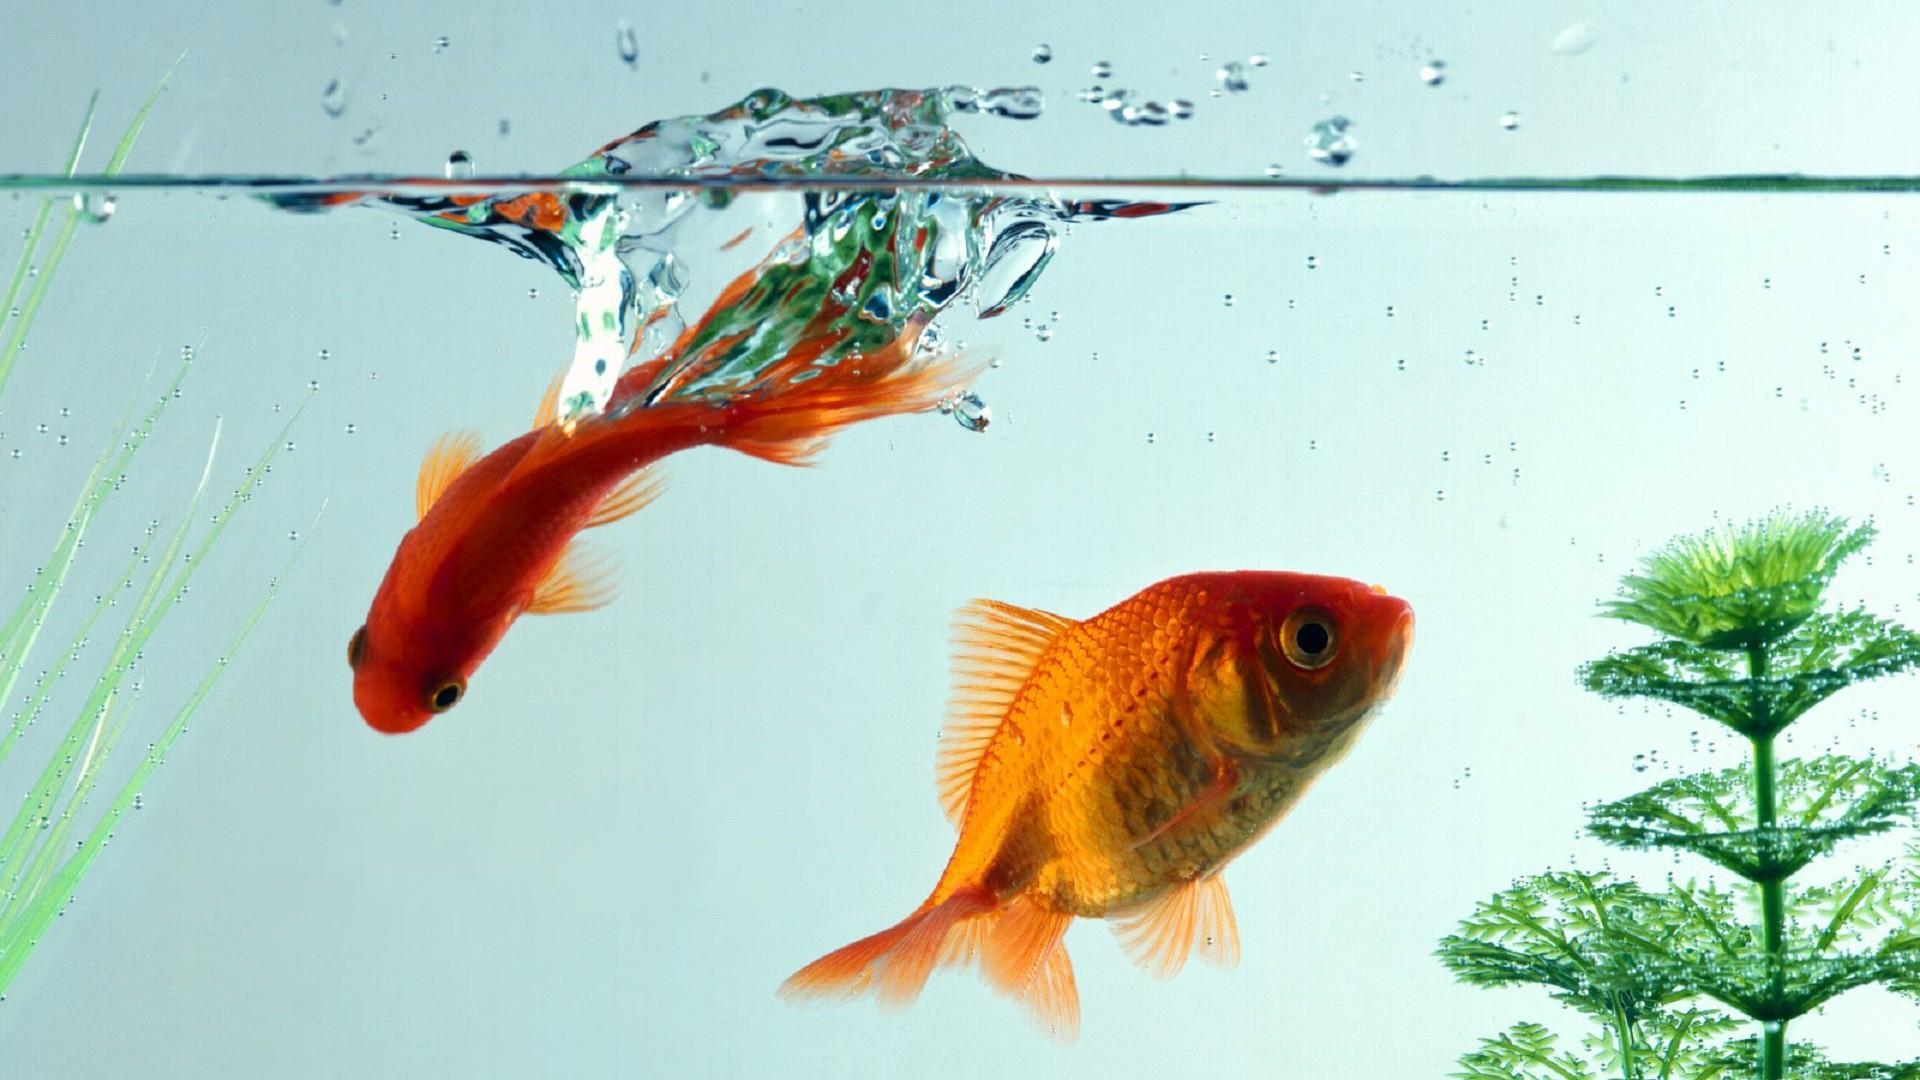 cute fish wallpaper - photo #25